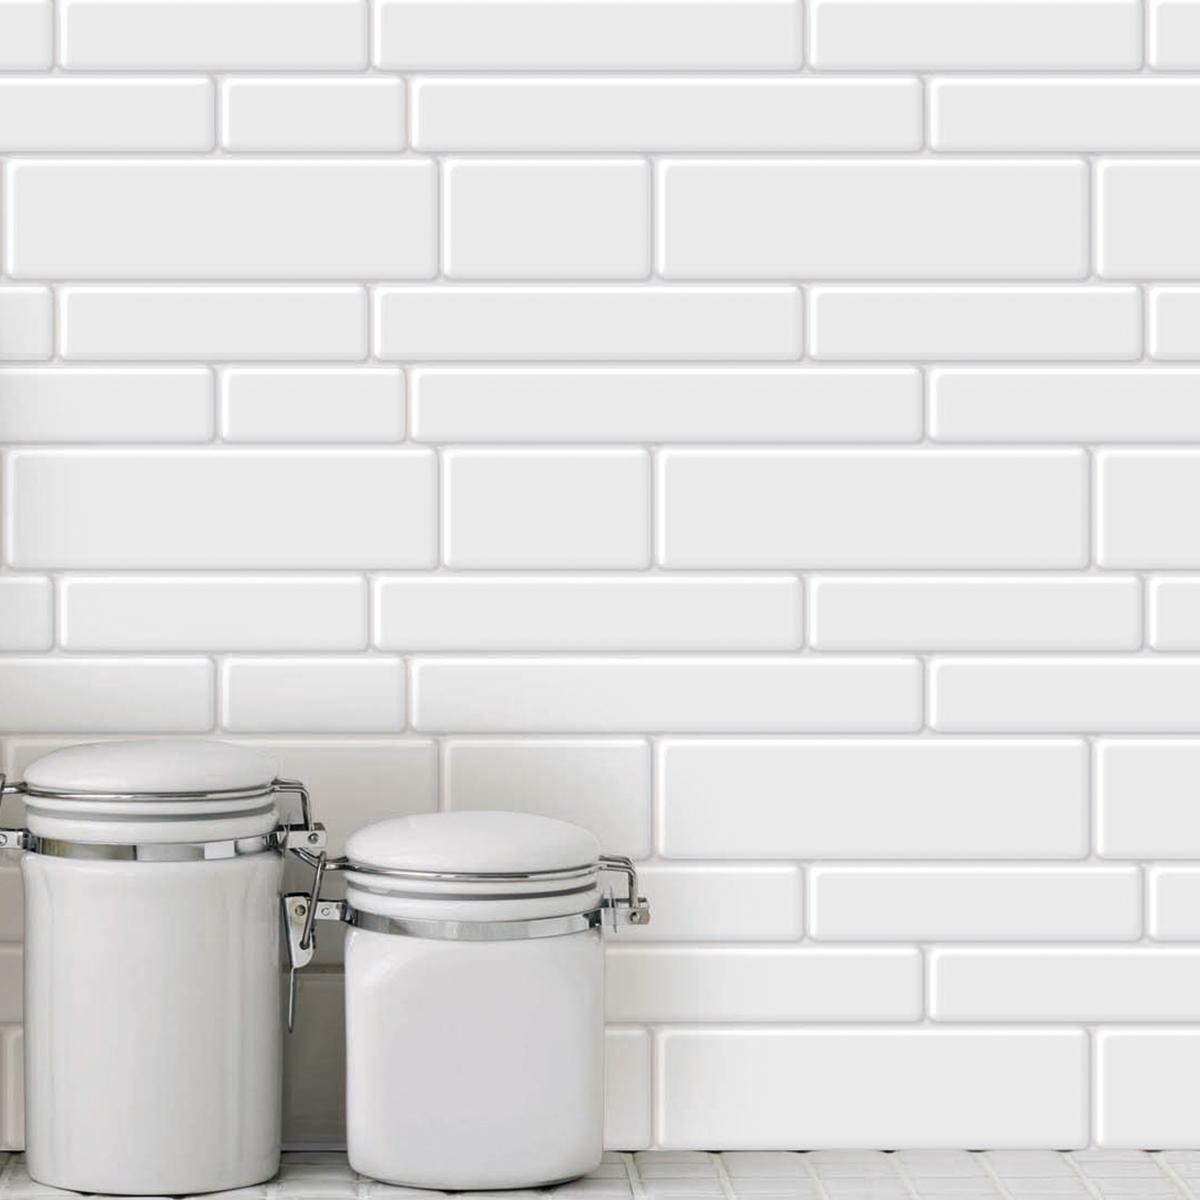 10-Sheet Peel and Stick Tile Backsplash for Kitchen Shelf-Adhesive Wall Sticker Tile